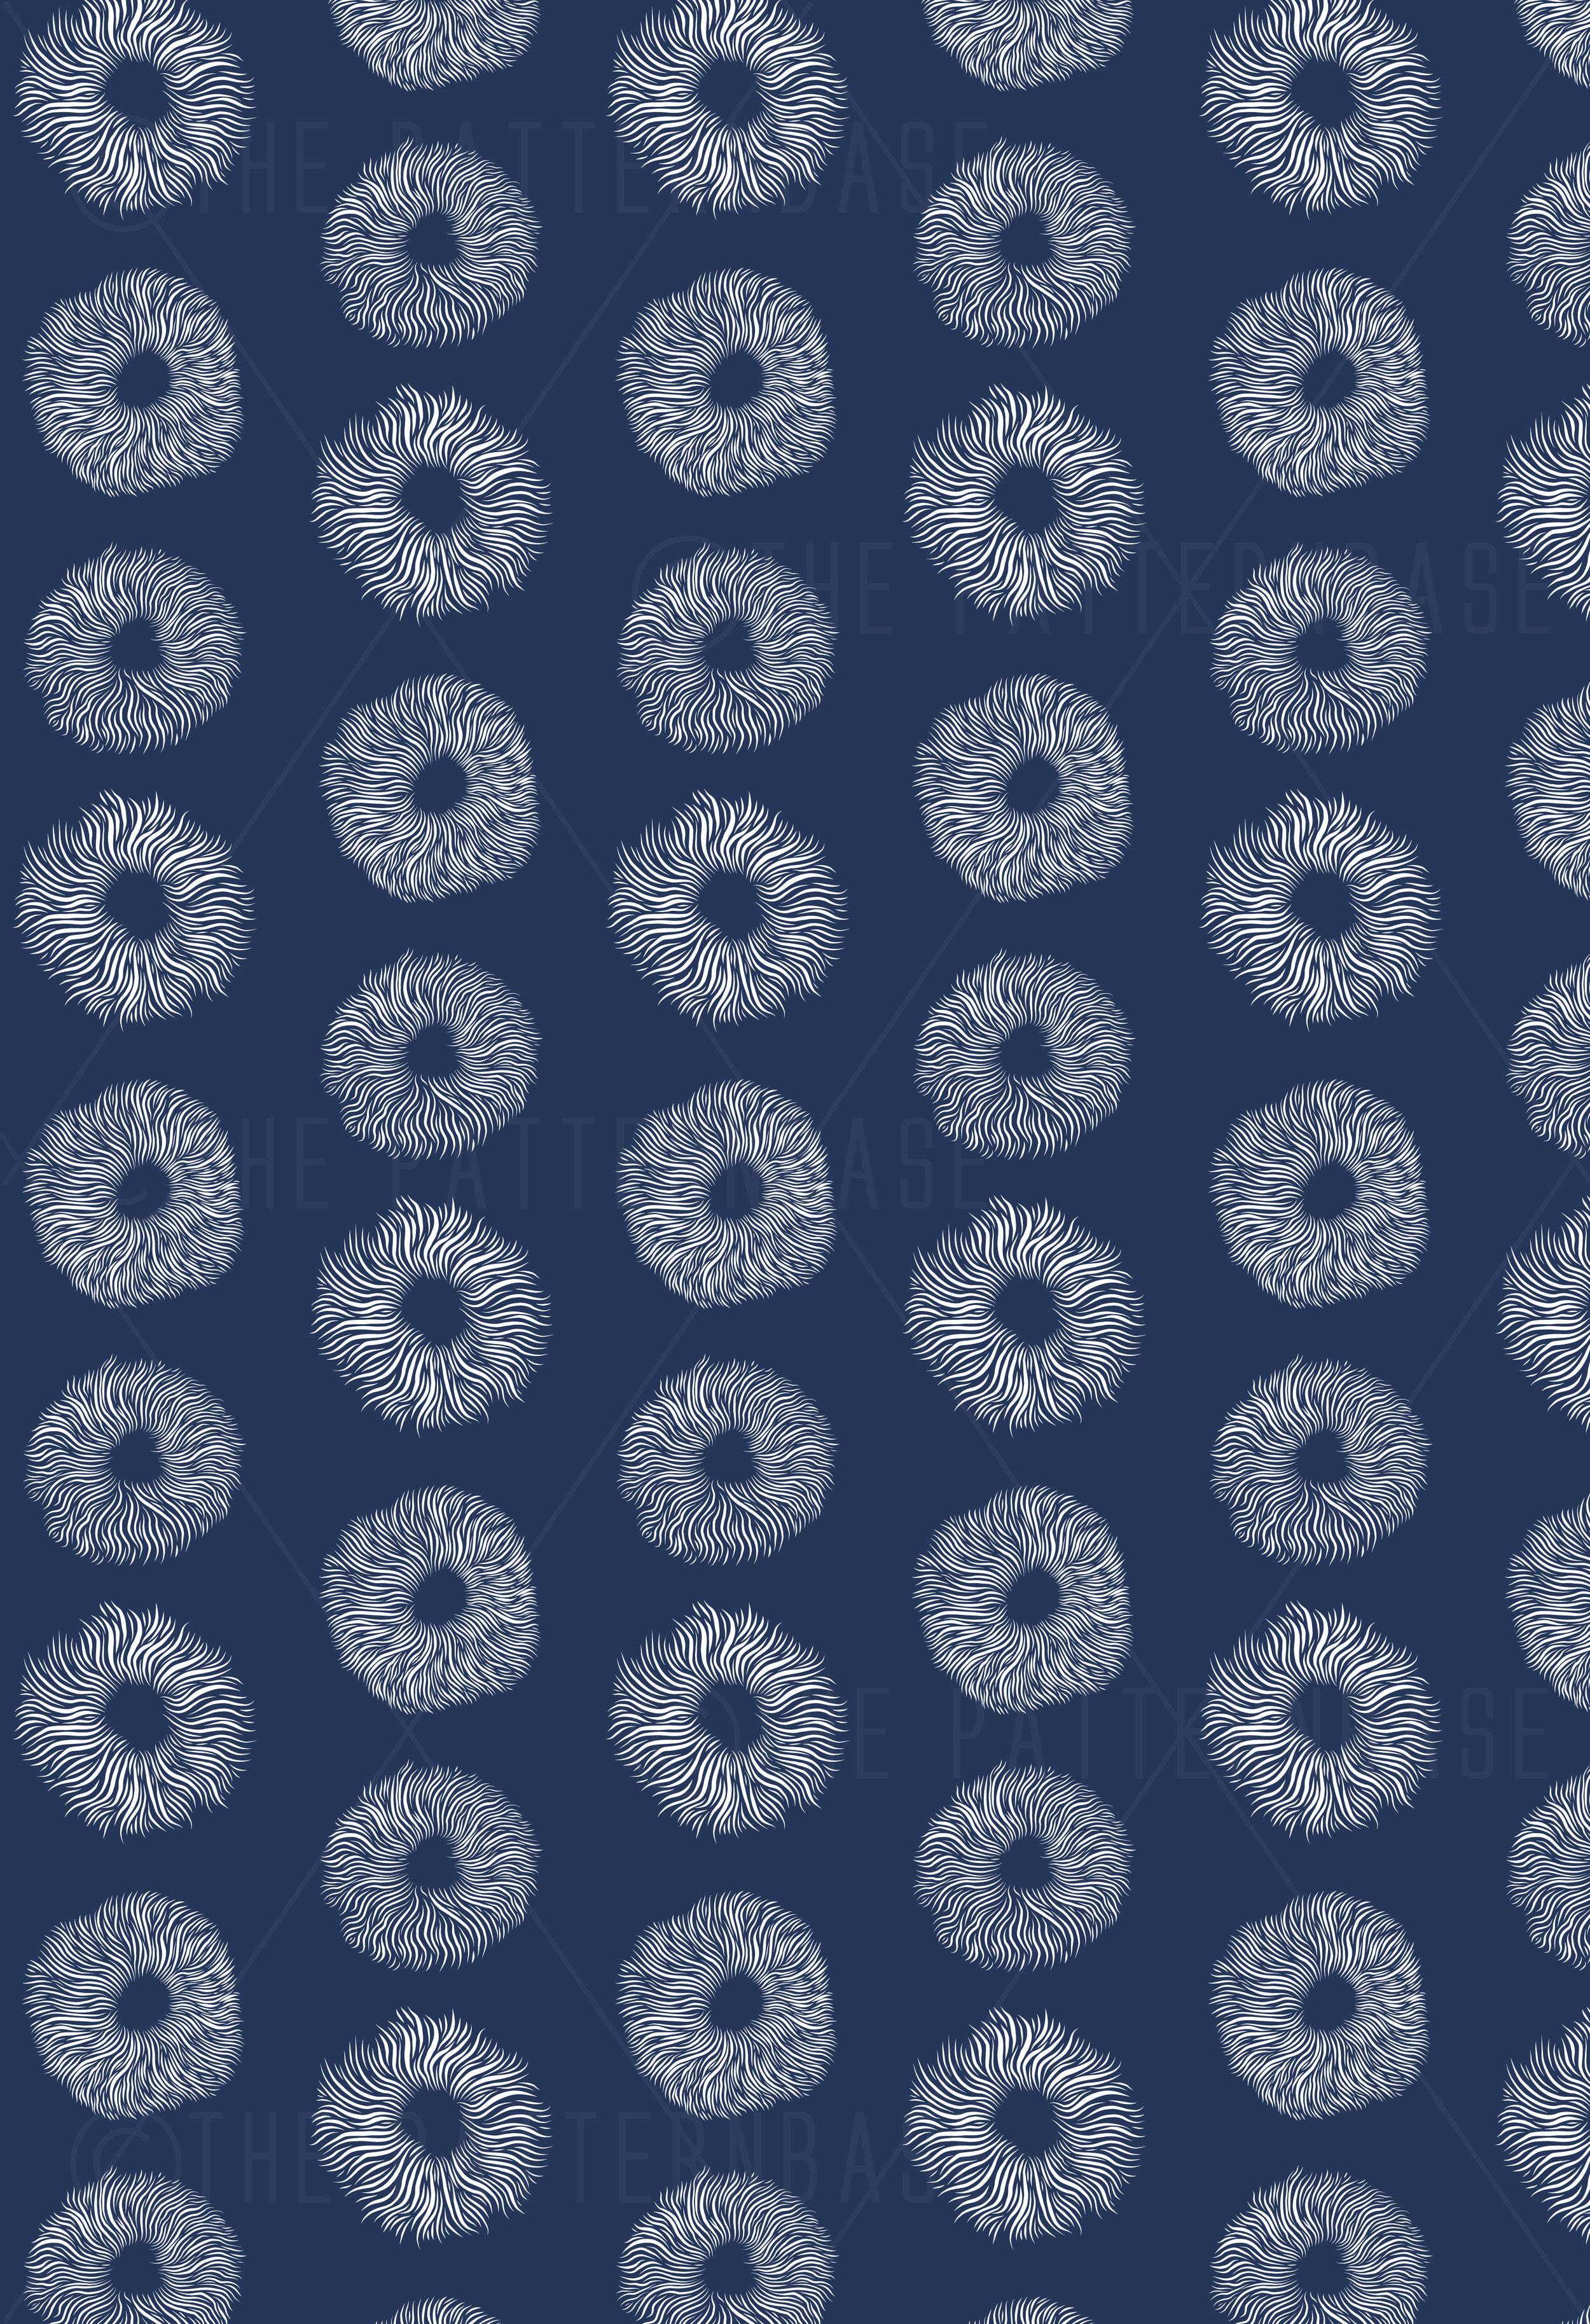 patternbase-sun-rays-wm.jpg